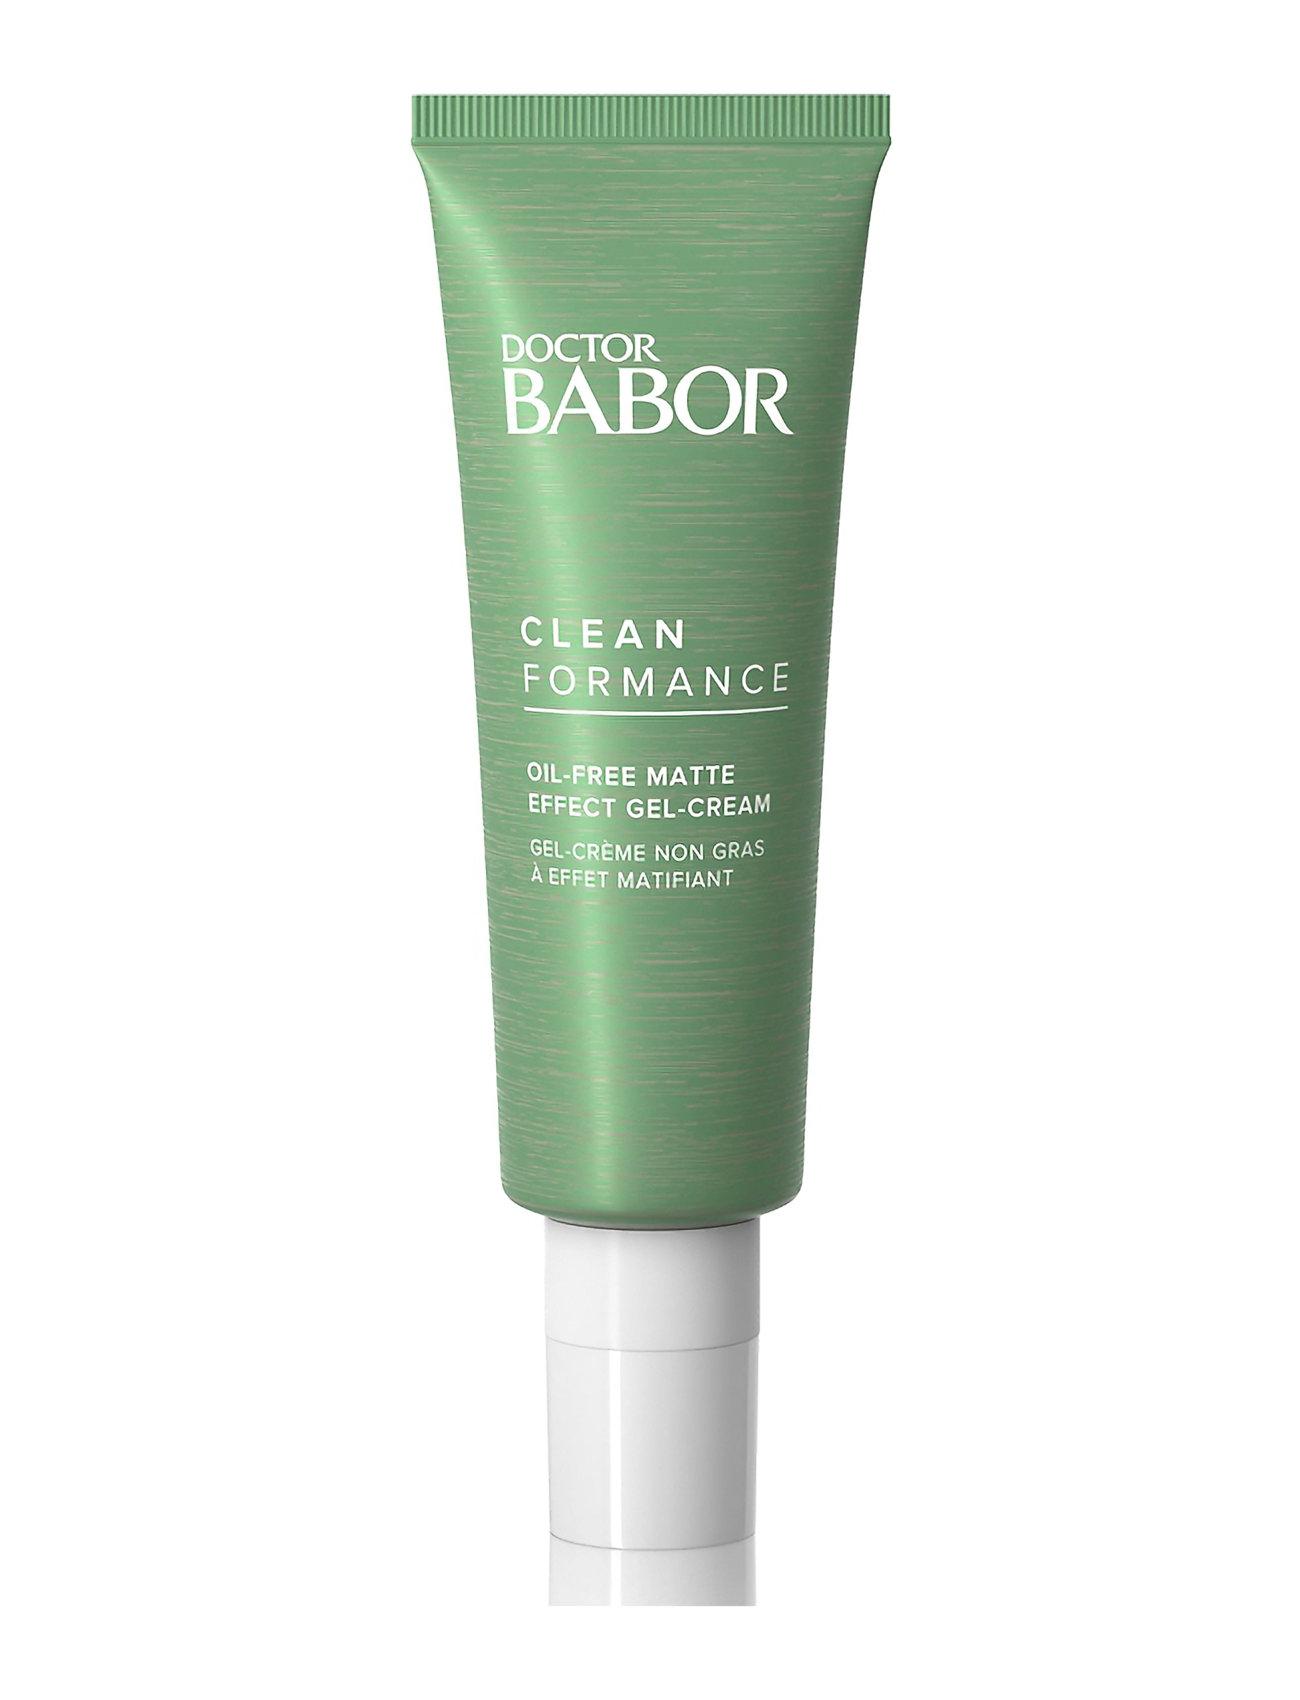 Cleanformance Oil-Free Matt Cream Beauty WOMEN Skin Care Face Cleansers Cleansing Gel Nude Babor